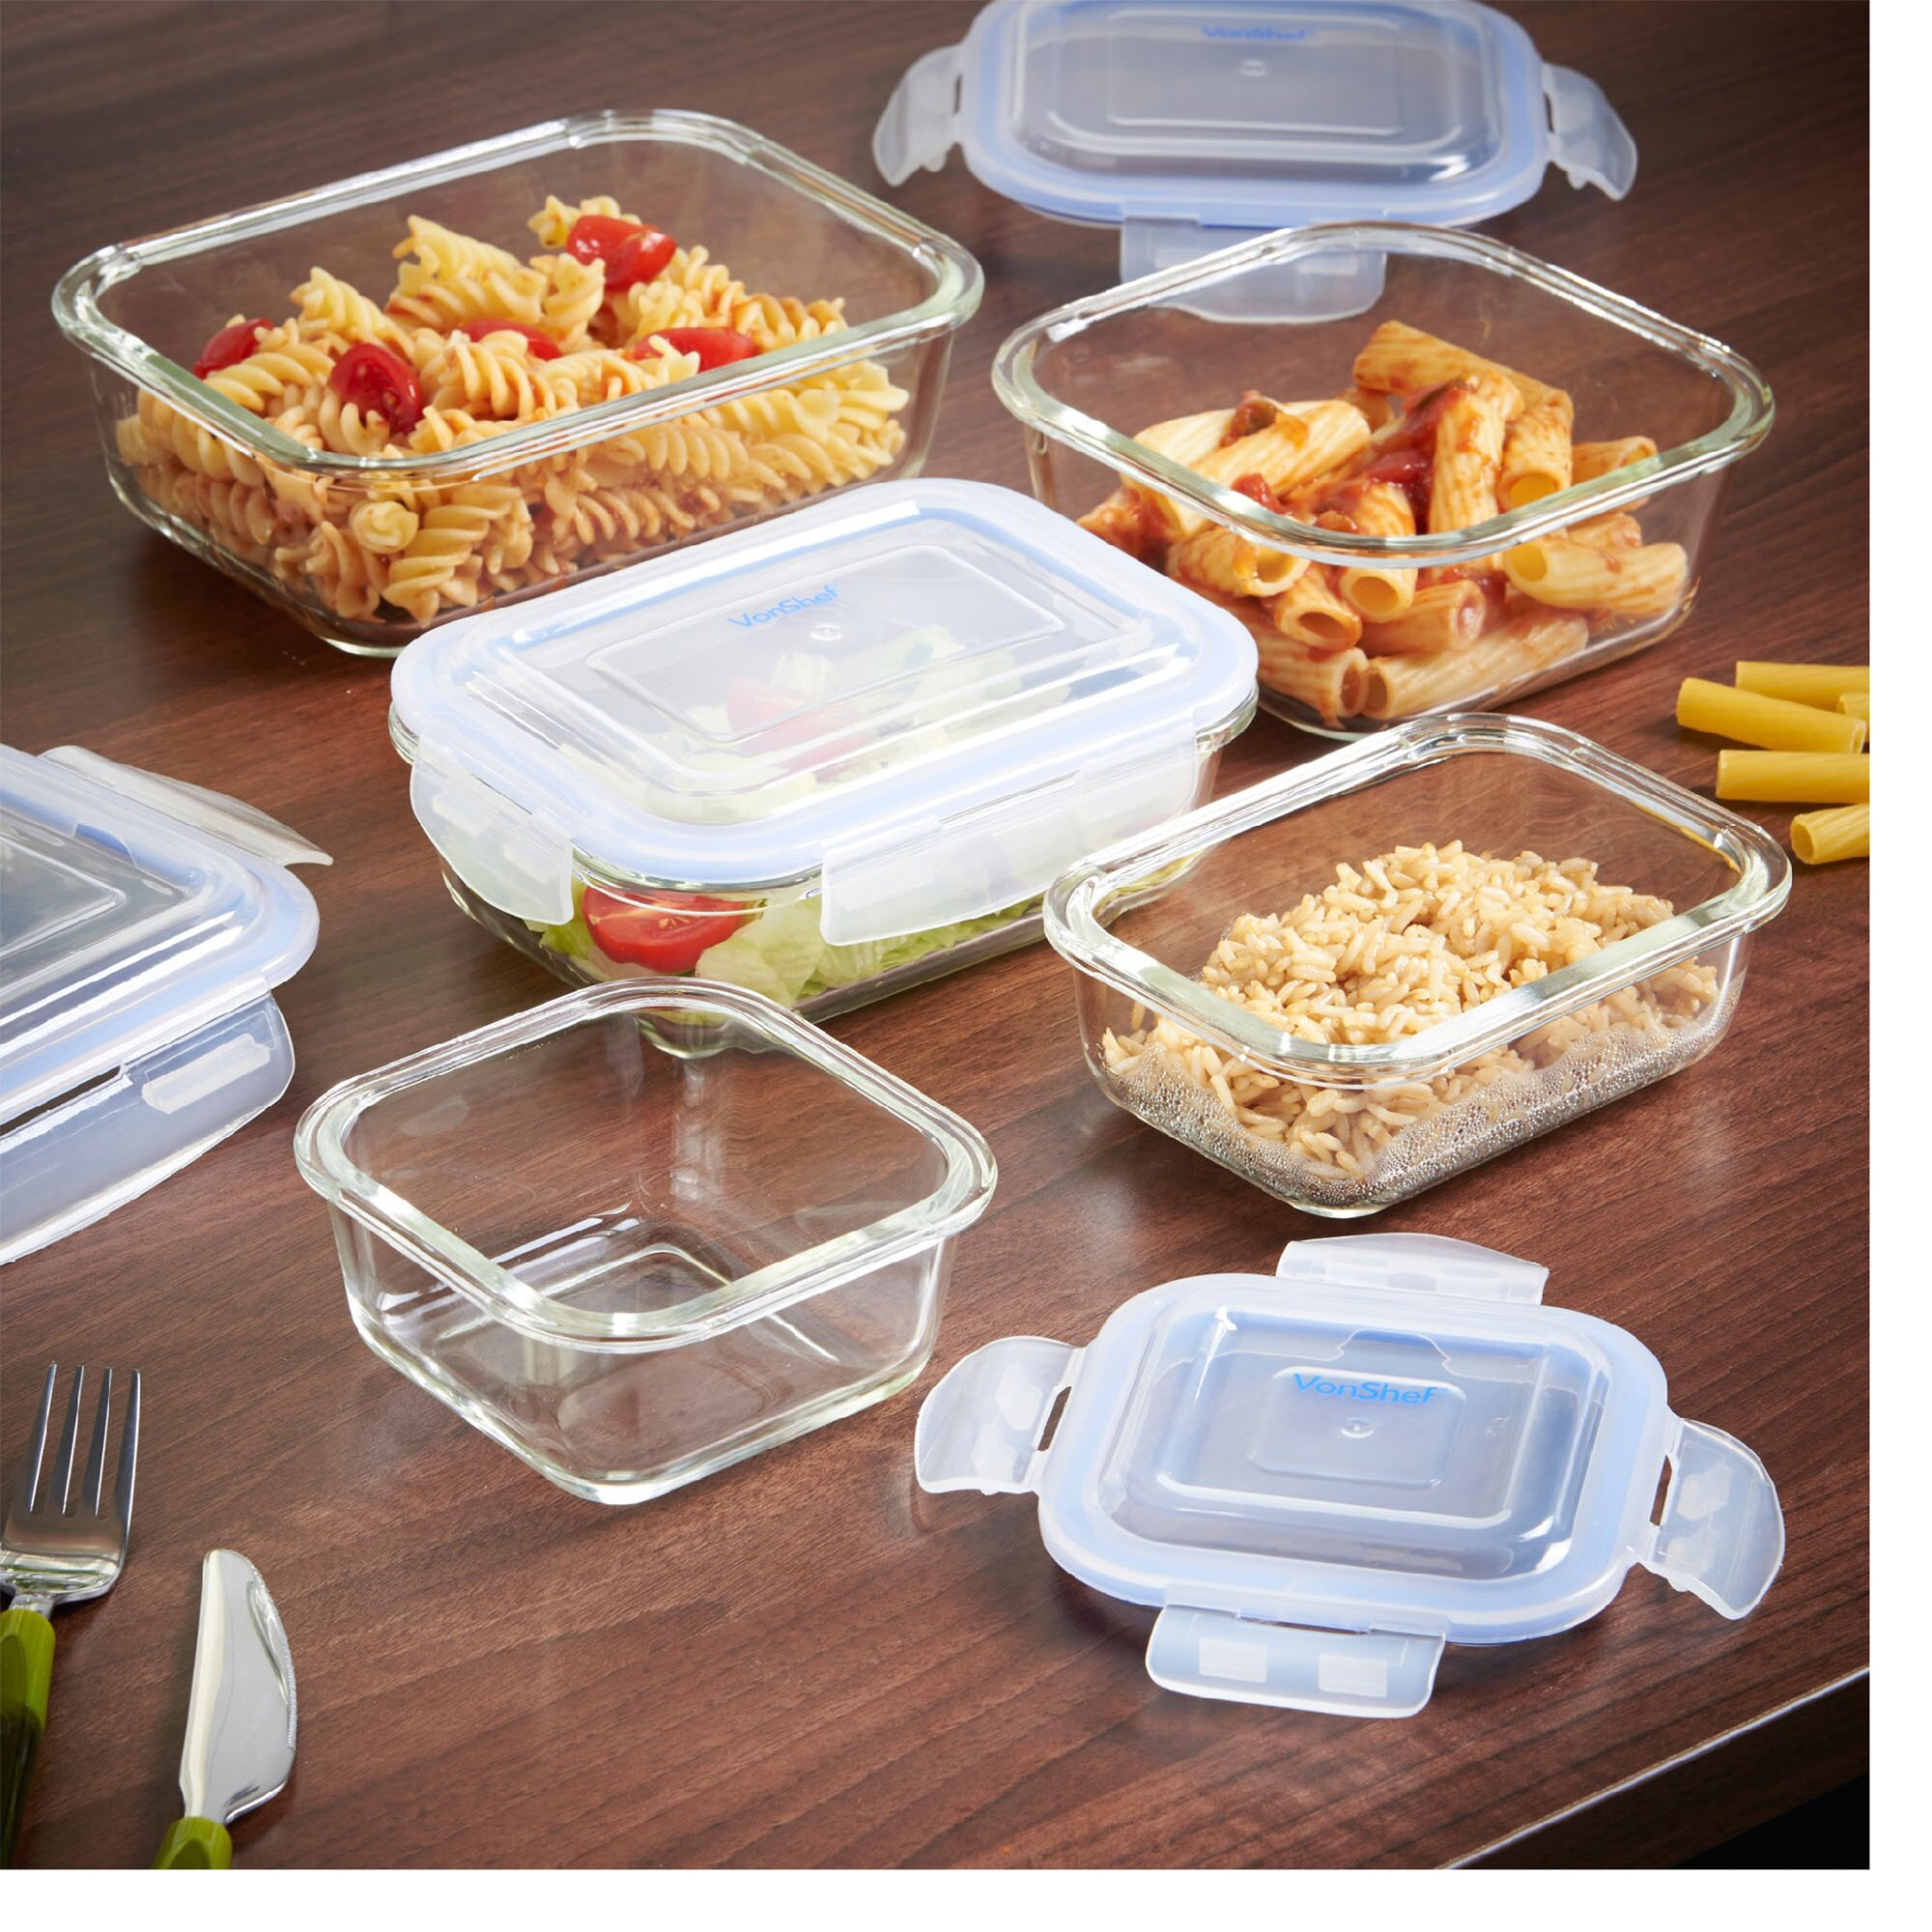 vonshef 10 piece glass food storage container set wayfair. Black Bedroom Furniture Sets. Home Design Ideas